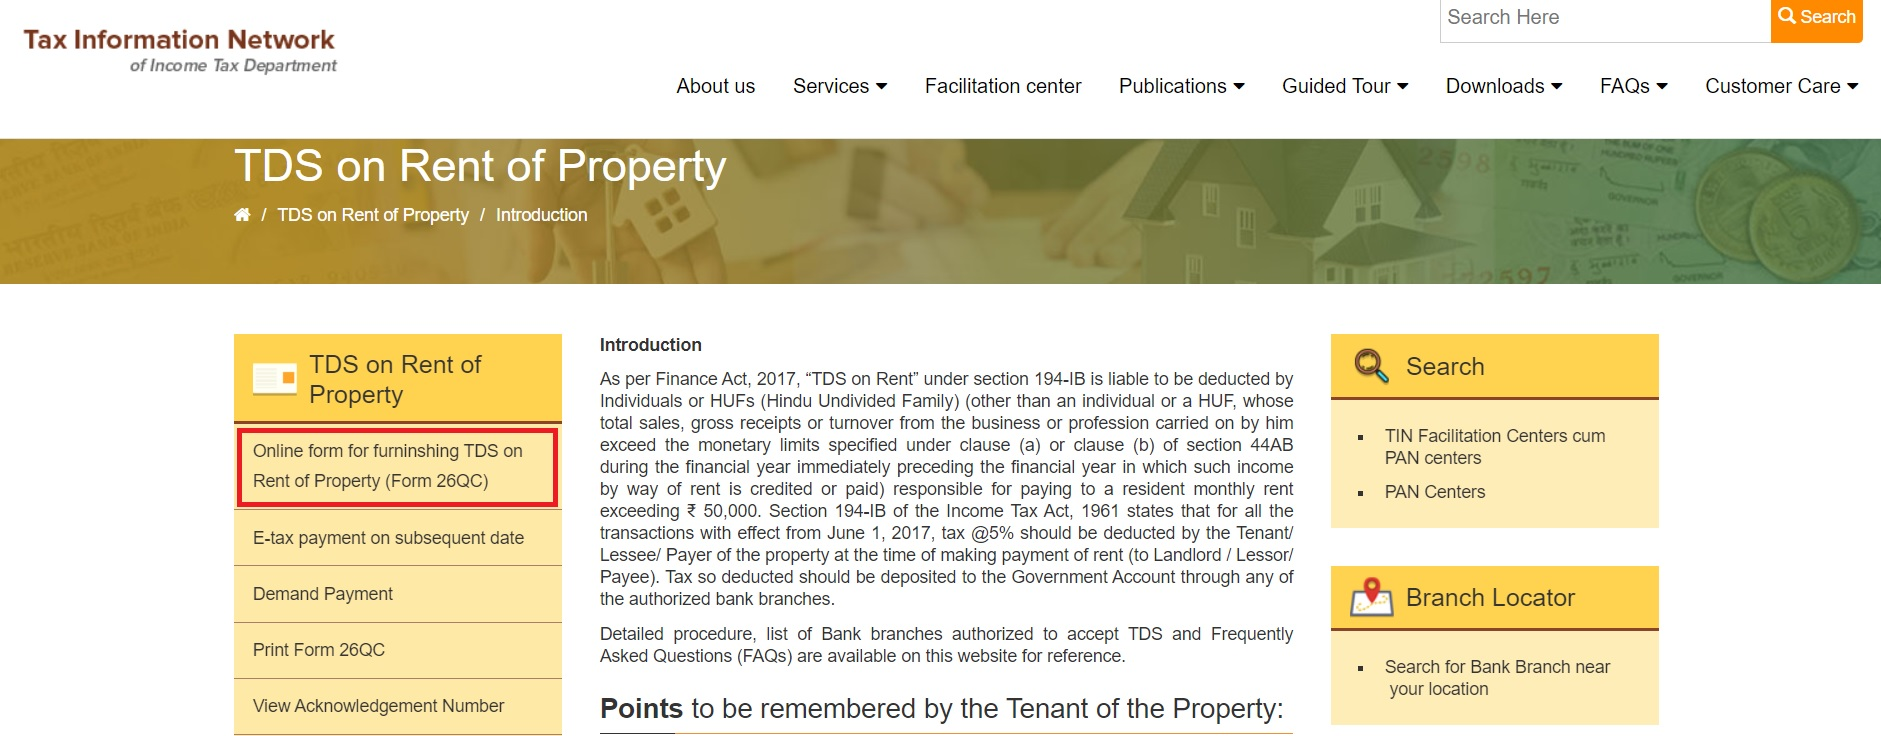 TIN_NSDL_Select_Form26QC